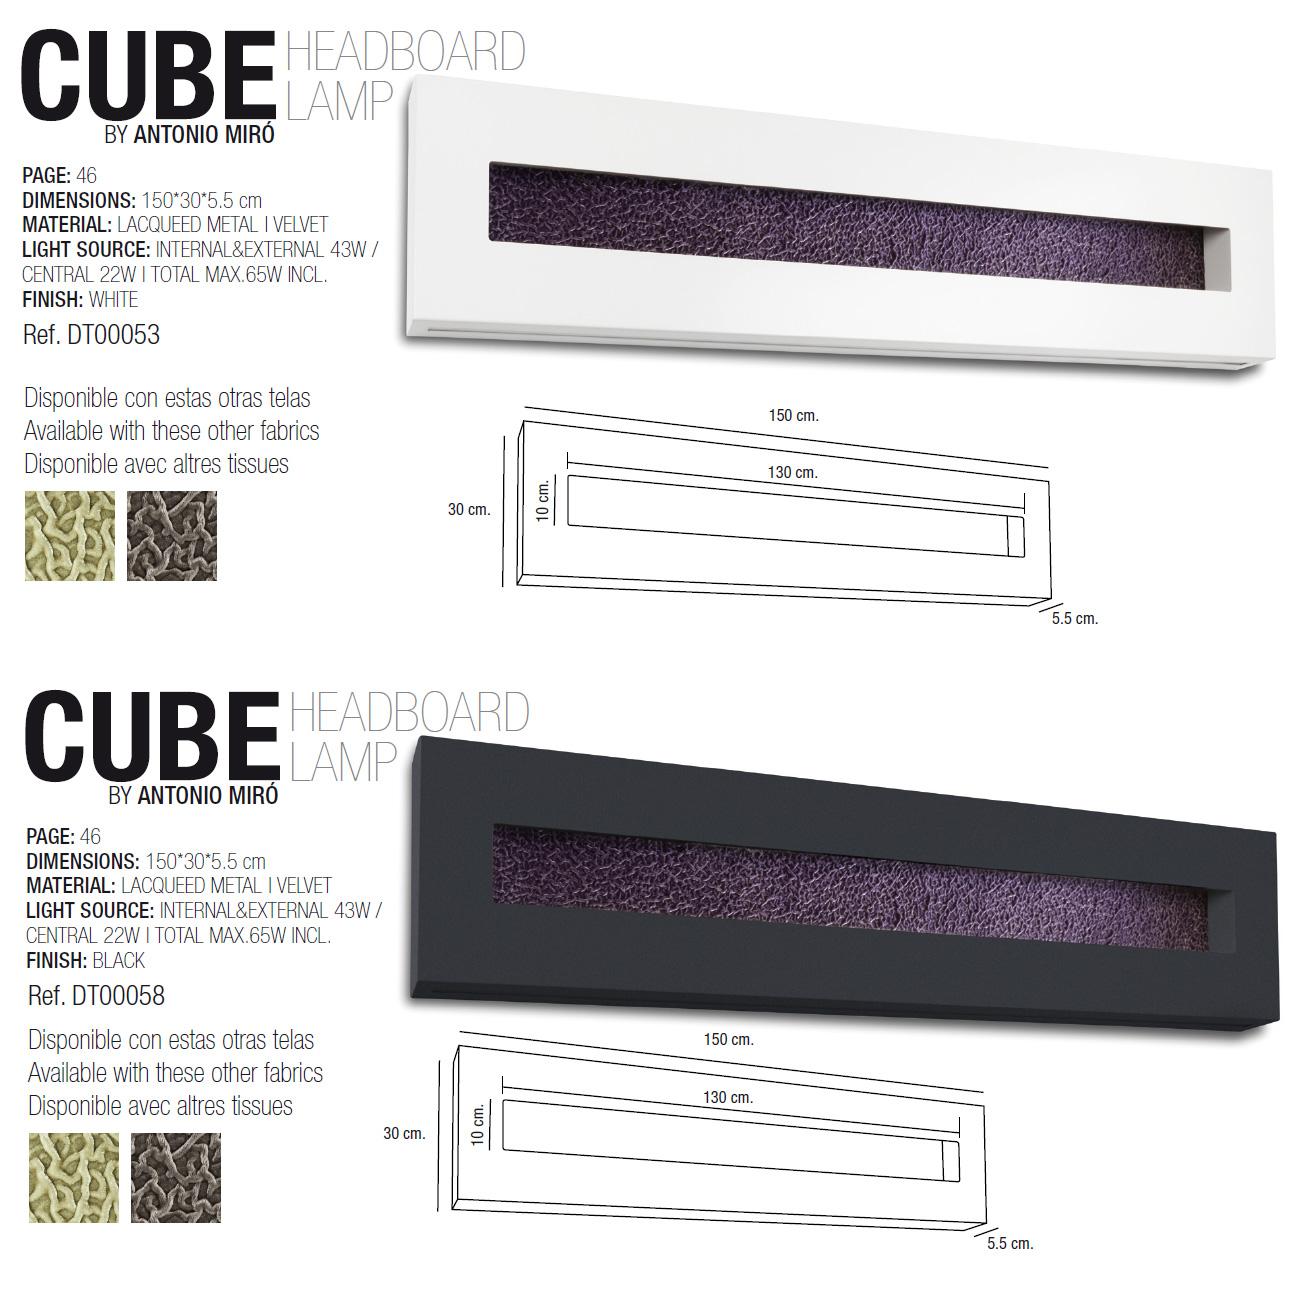 dekoratives cube headboard in schwarz dresslight dt00058 click. Black Bedroom Furniture Sets. Home Design Ideas